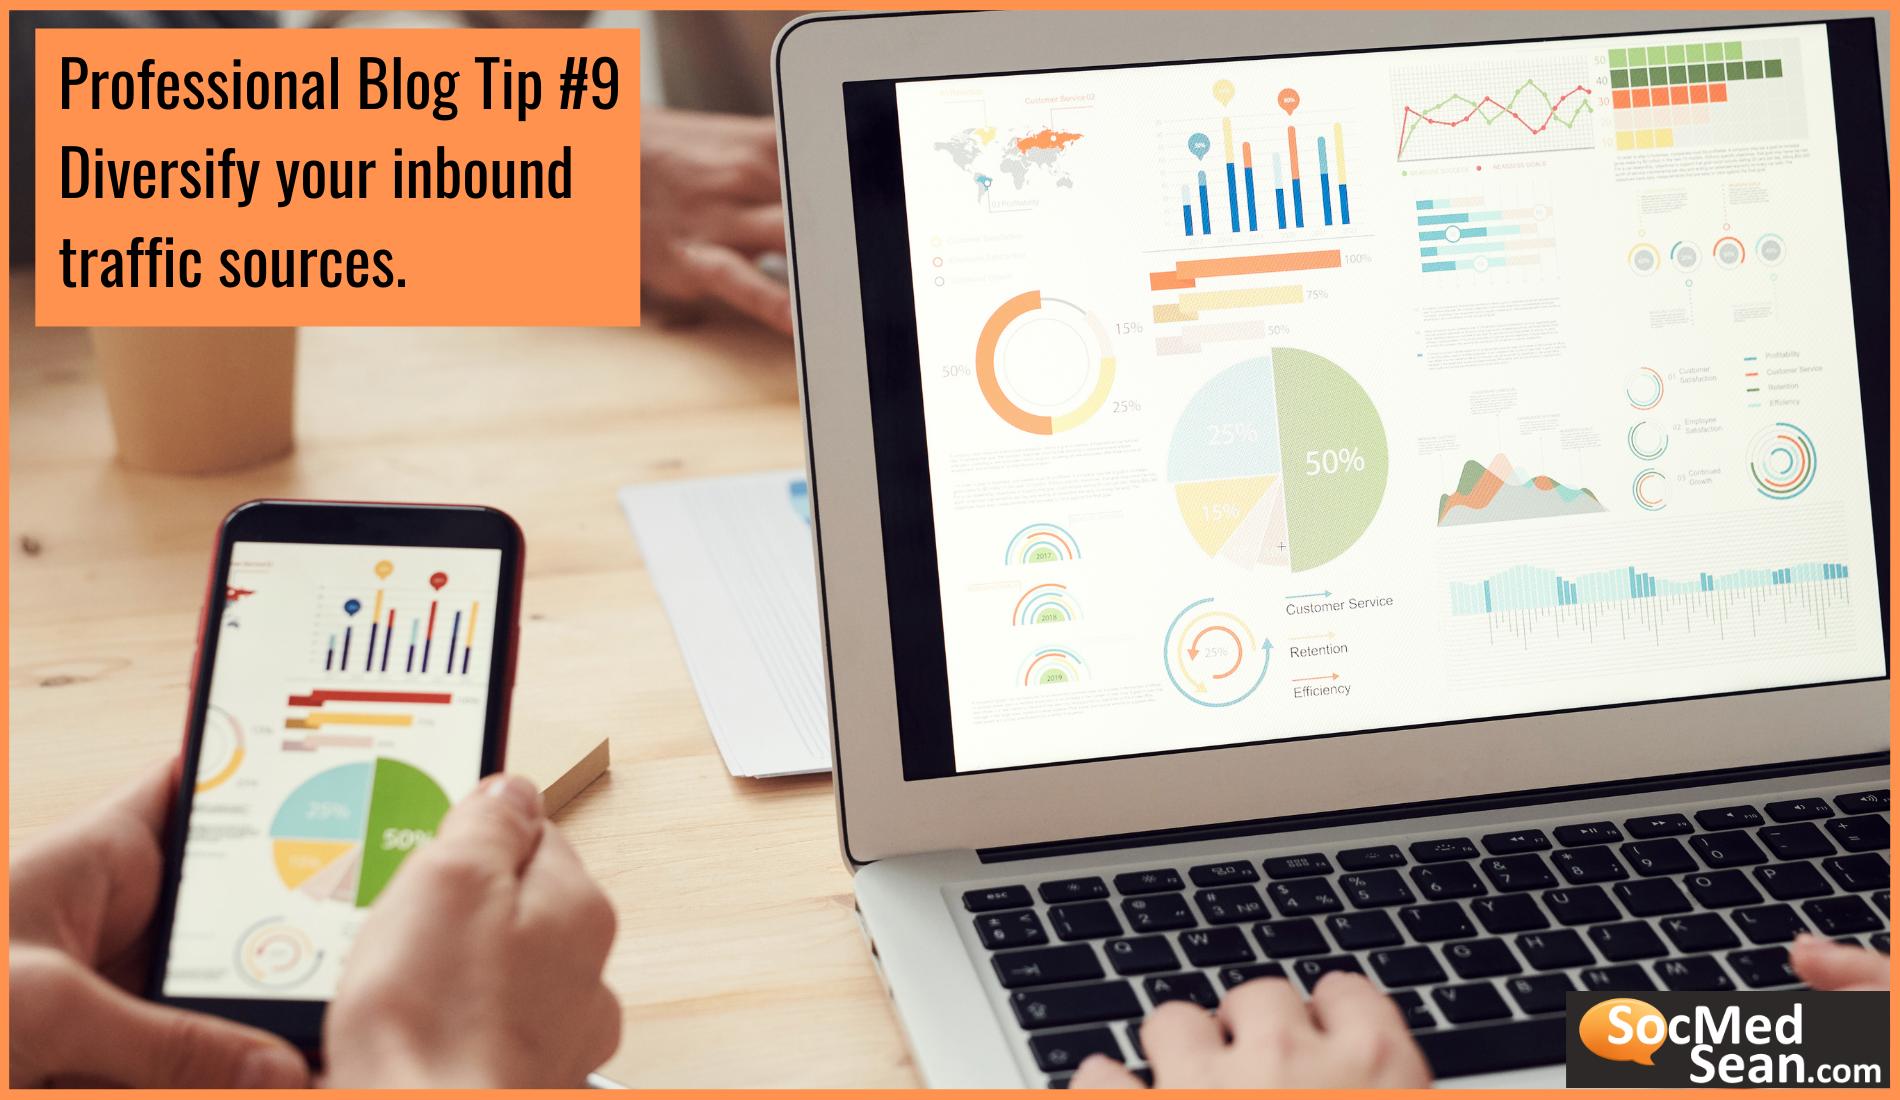 Blogging Tip - Diversify your inbound traffic sources